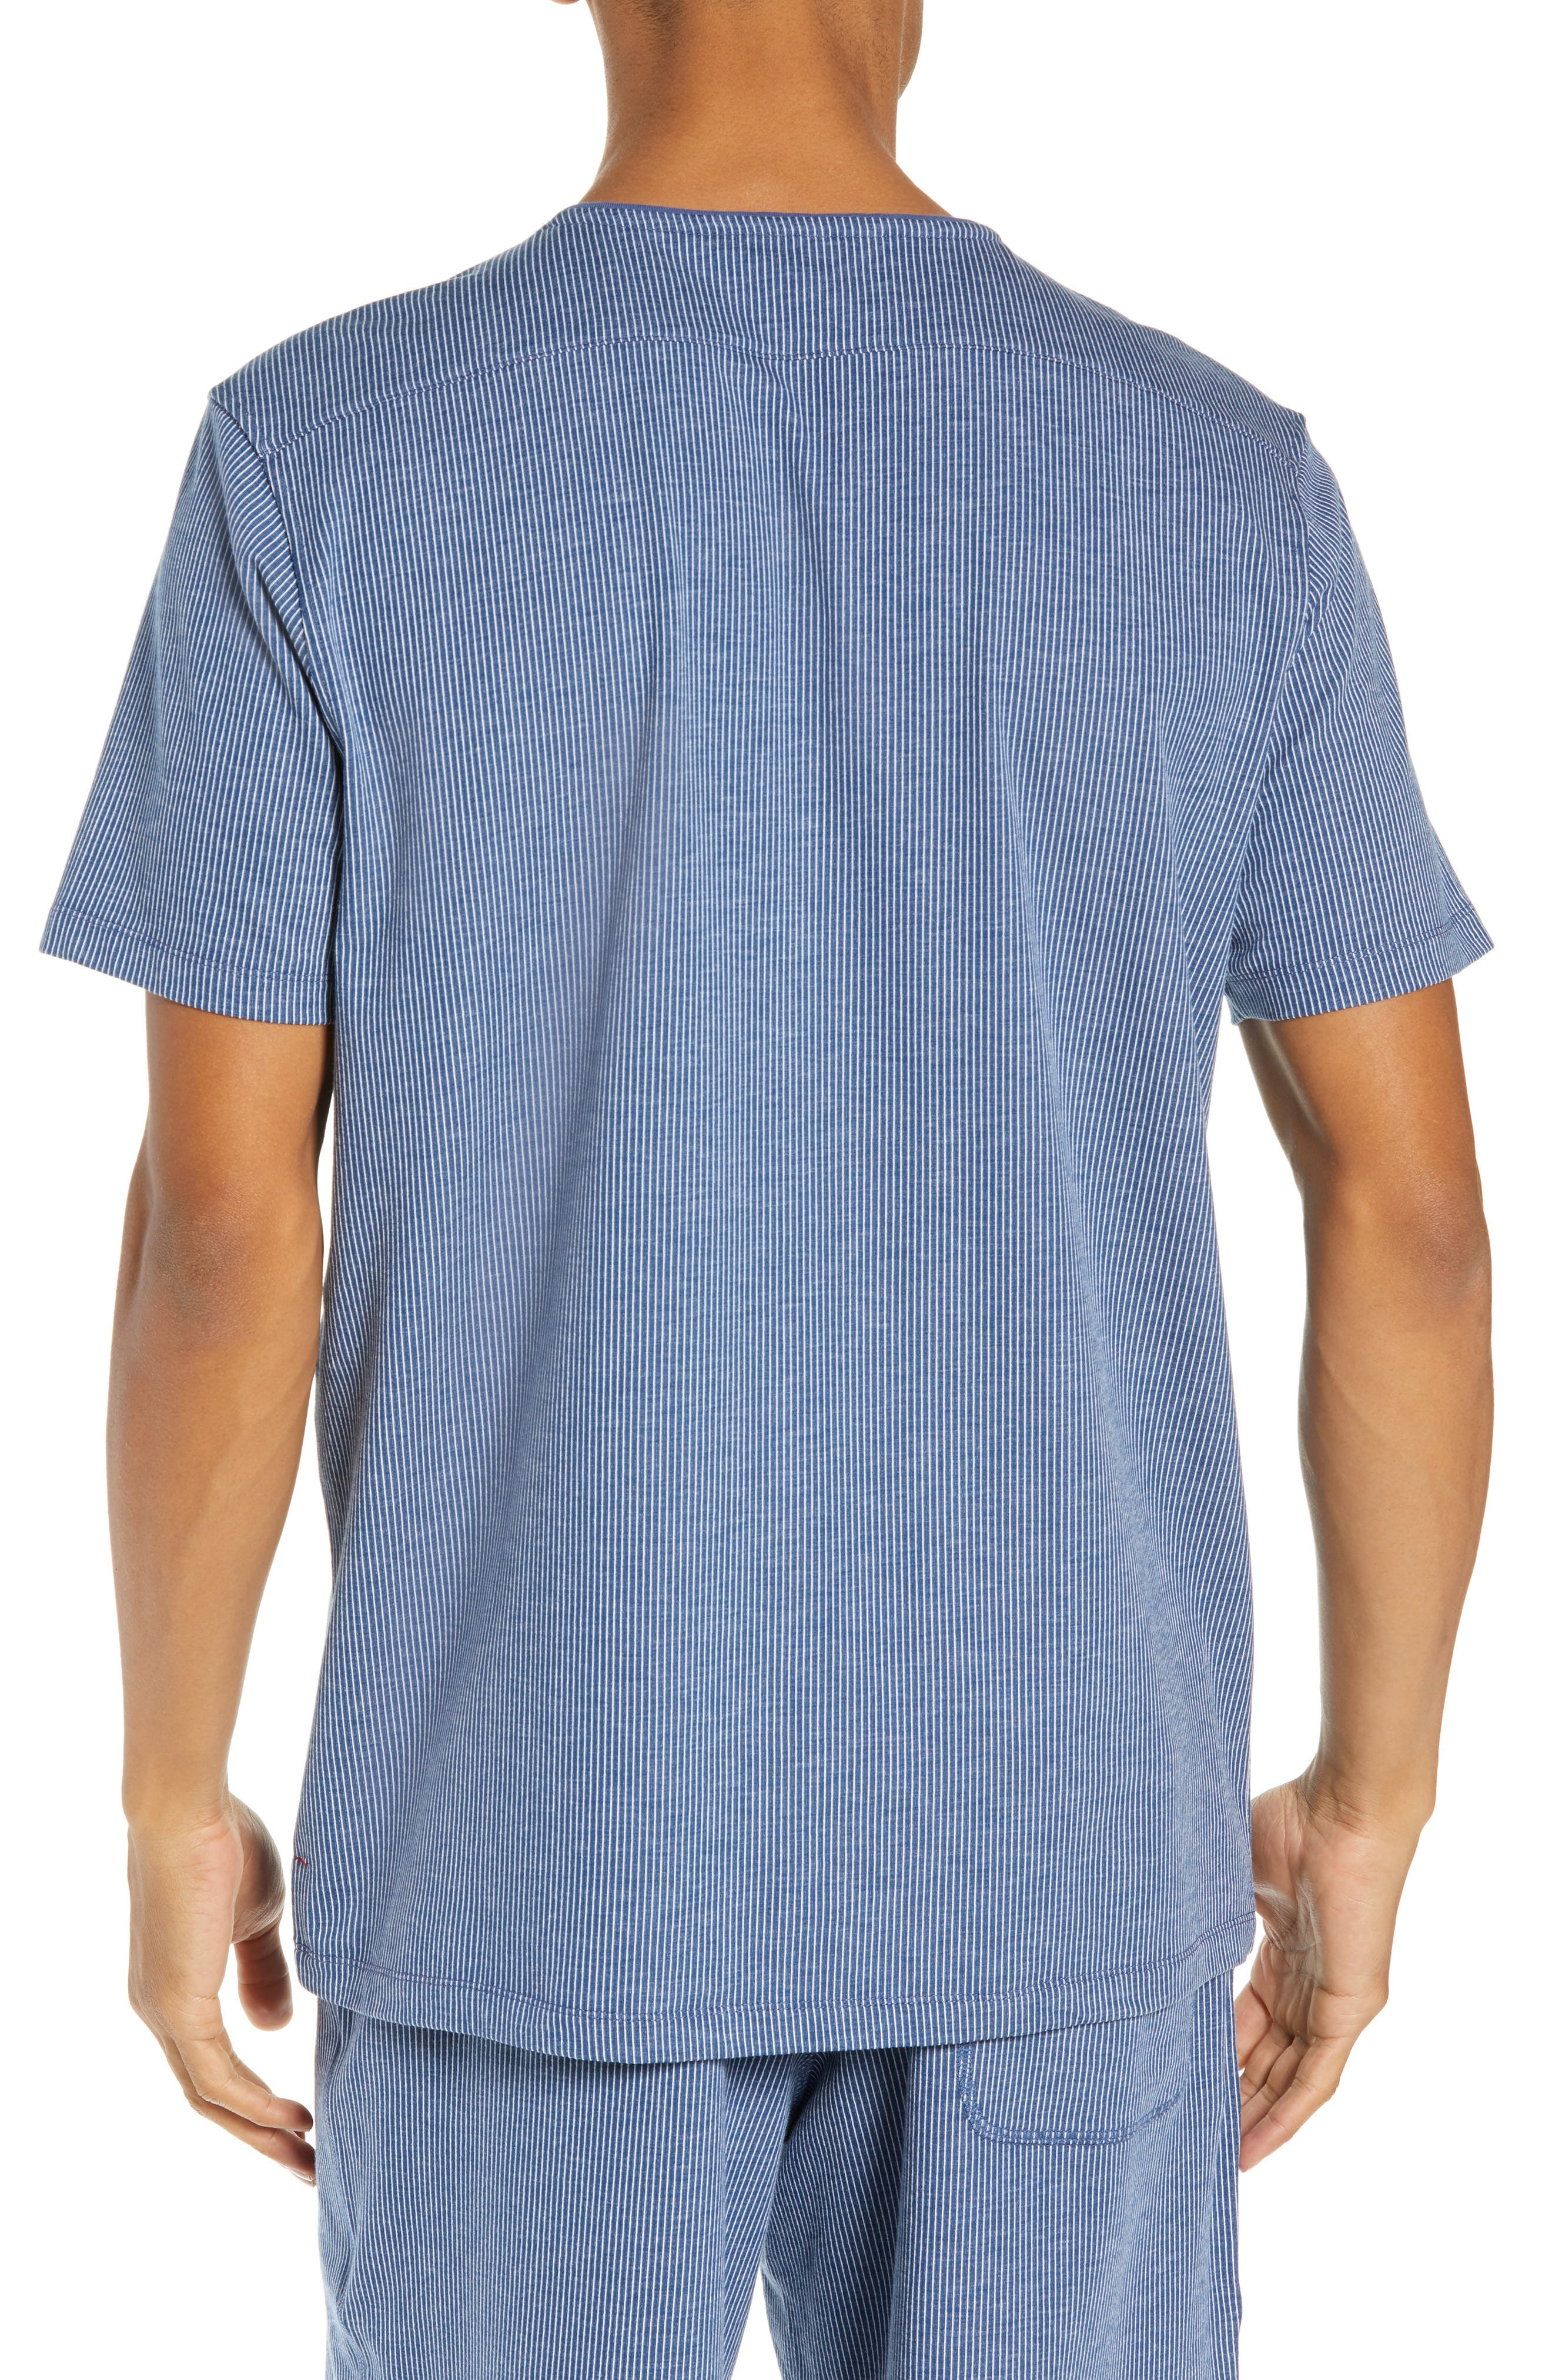 Pinstripe Sleep T-Shirt,                             Alternate thumbnail 2, color,                             BLUE